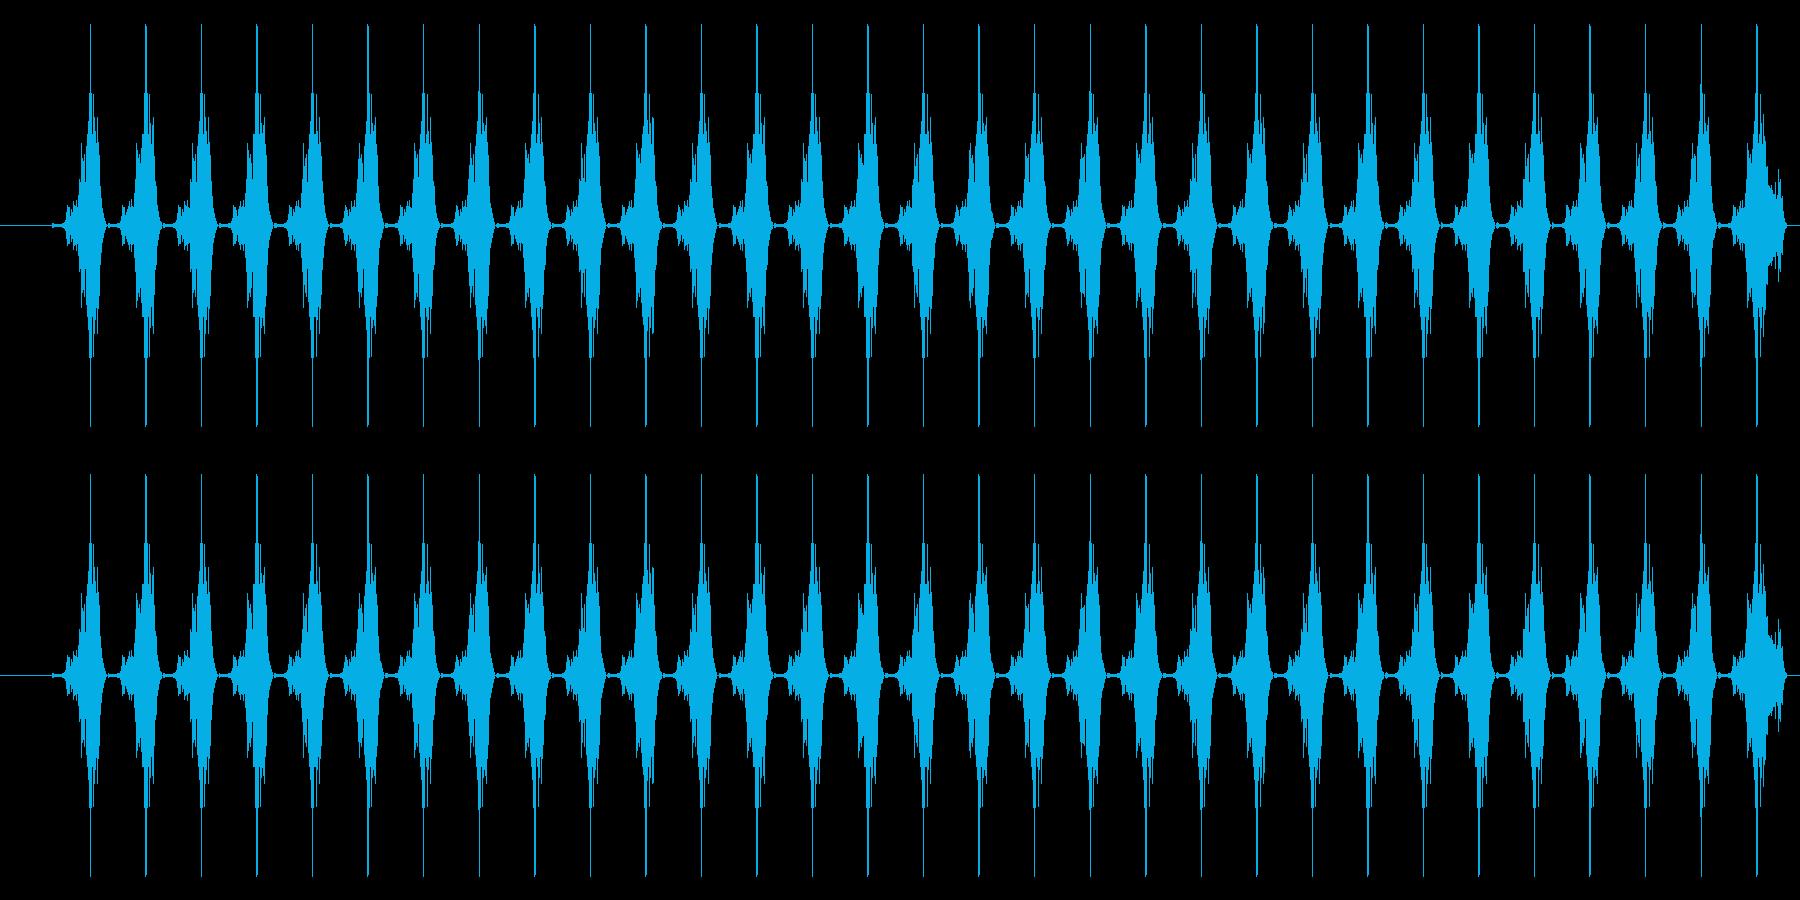 SNES-アクション01-19(メッセーの再生済みの波形